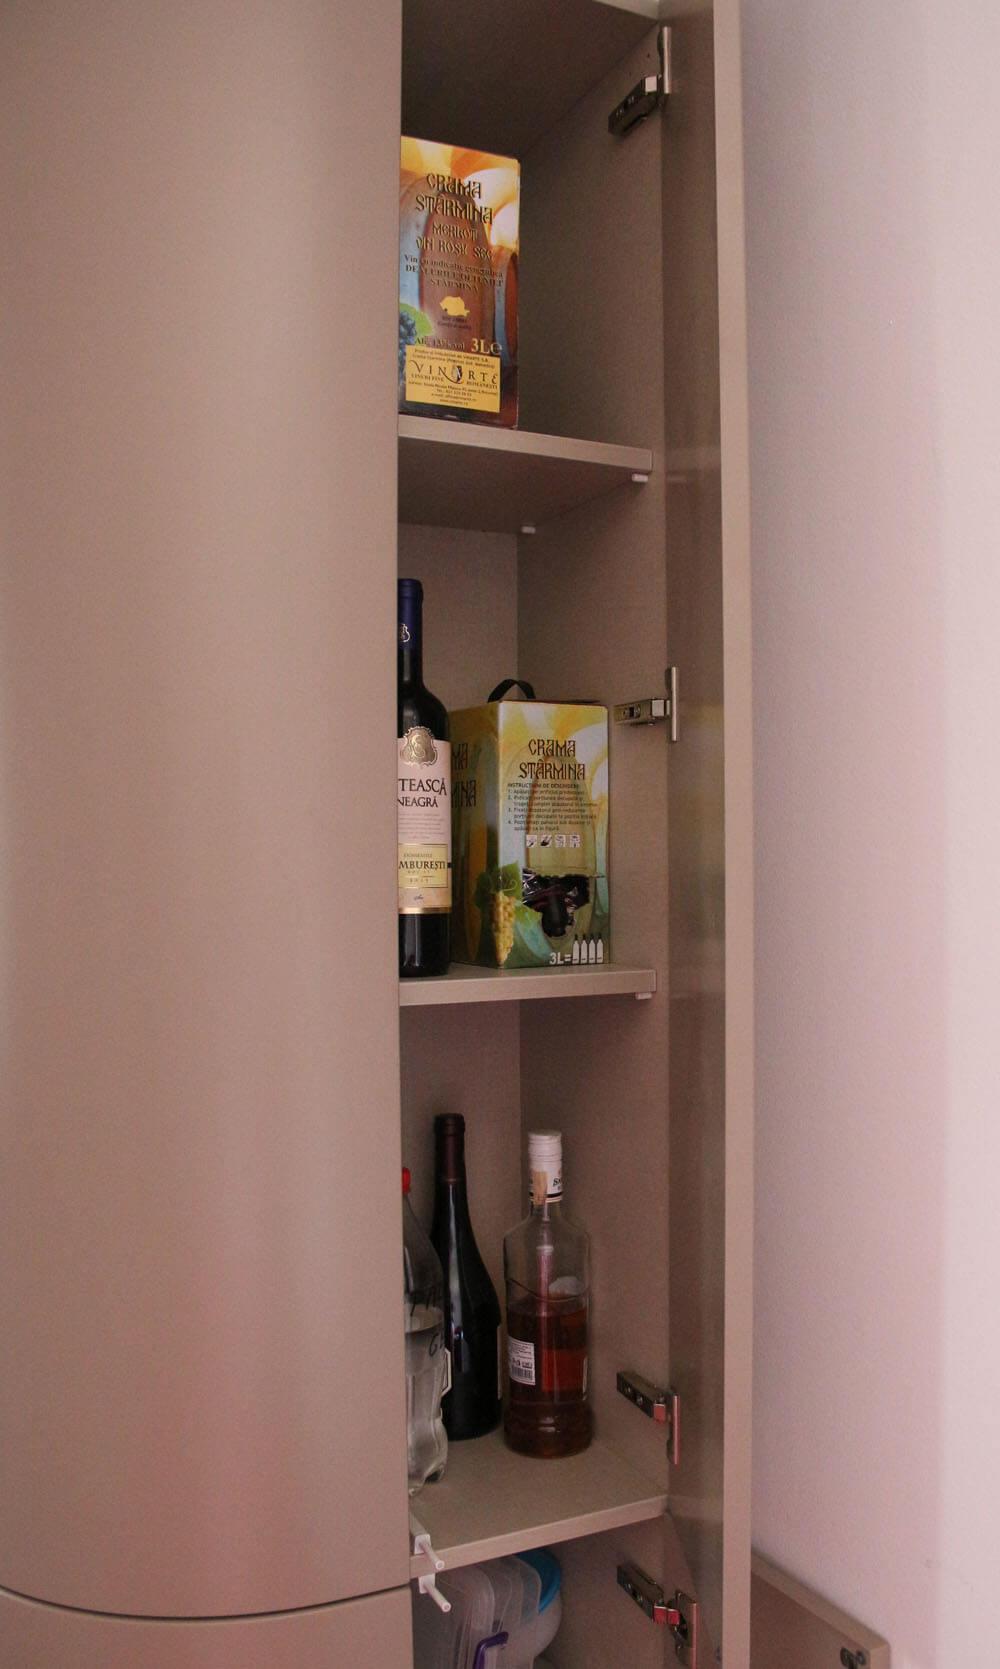 На кухне нашлось место для мини-бара